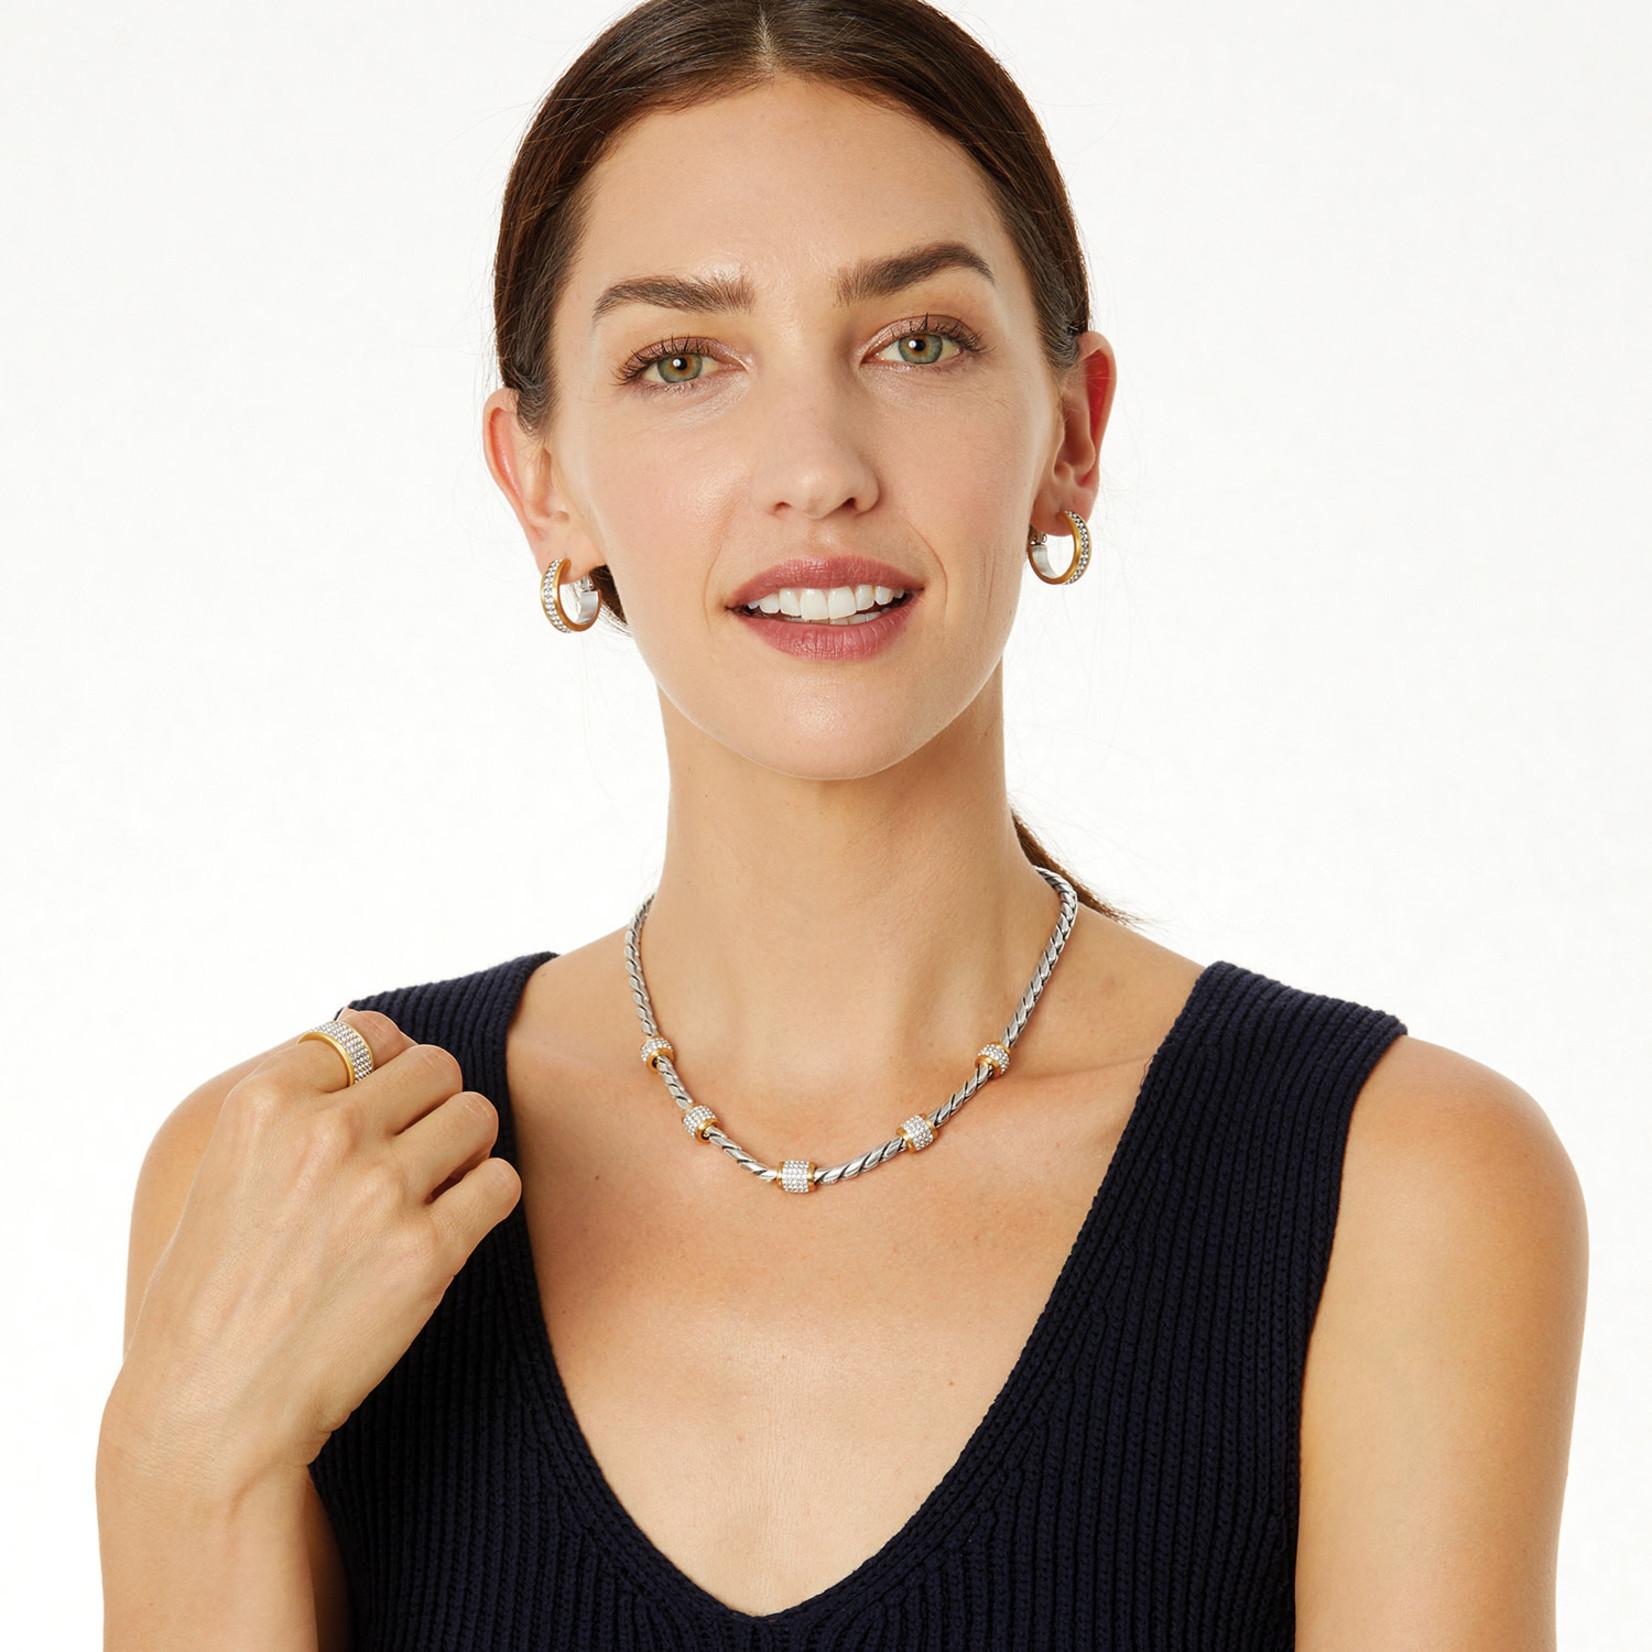 Brighton JN3480 Meridian Necklace - Silver/Gold